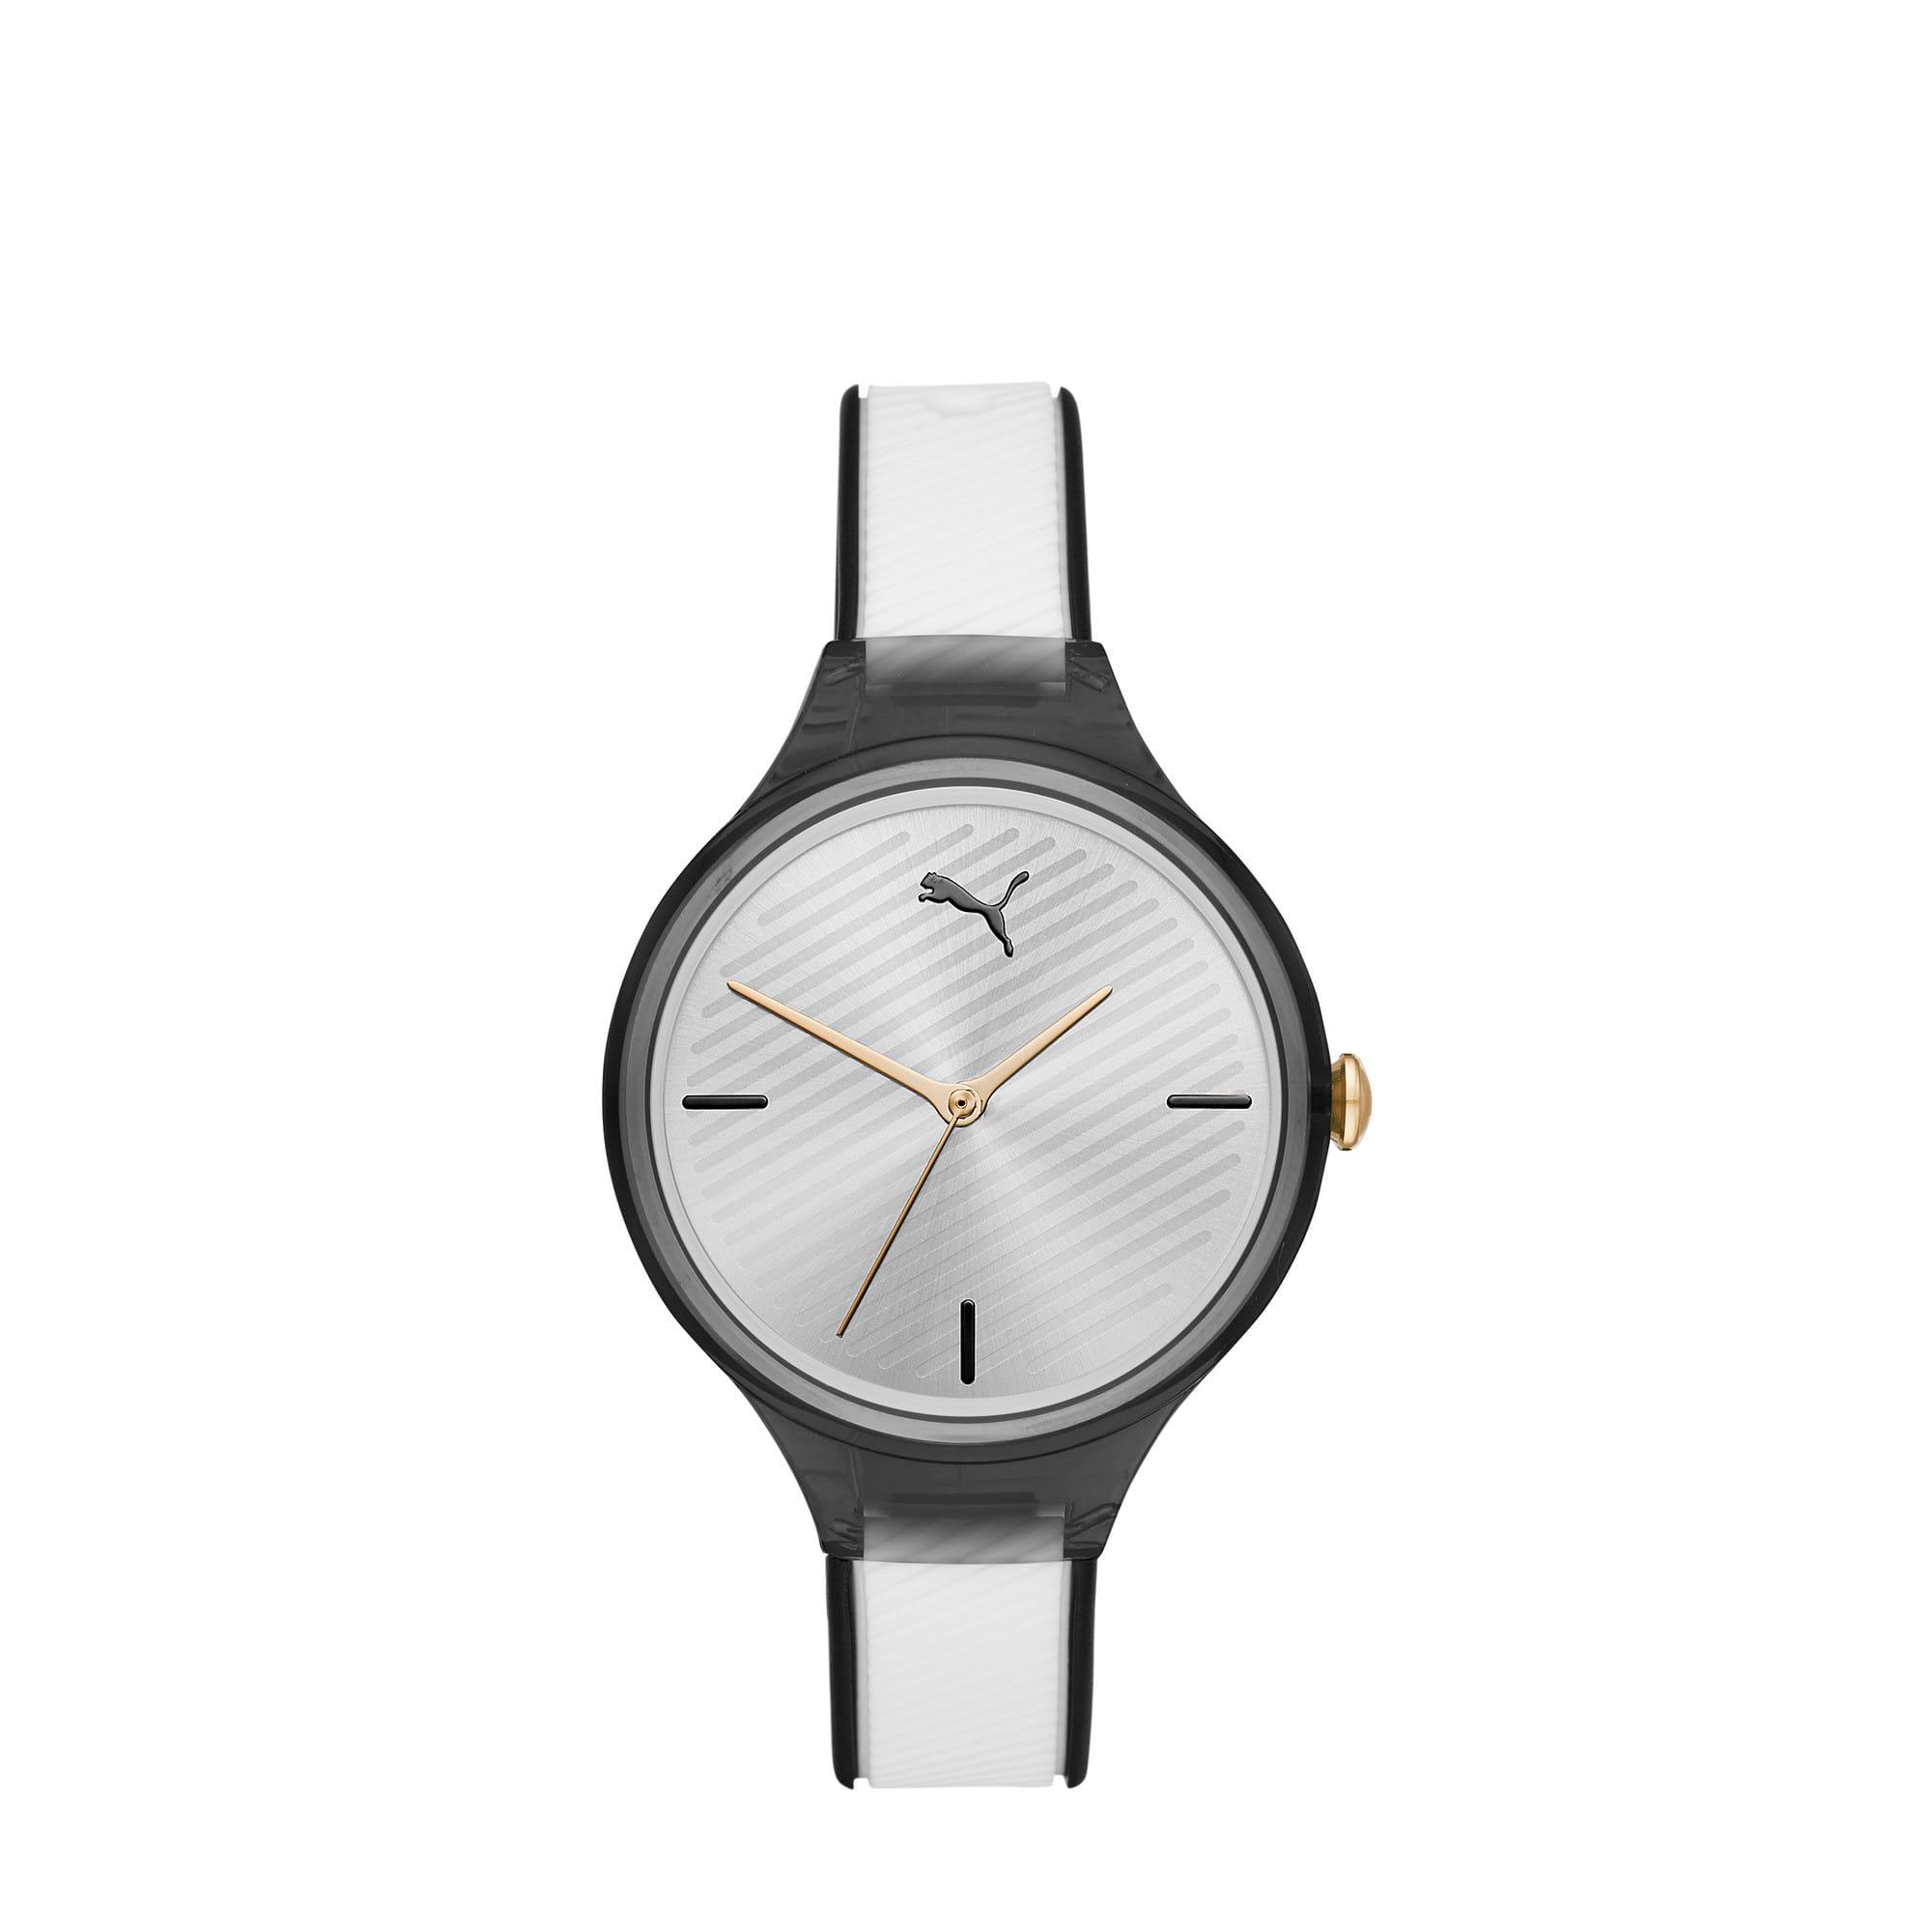 Thumbnail 1 of CONTOUR Ultra Slim Women's Watch, Black/White, medium